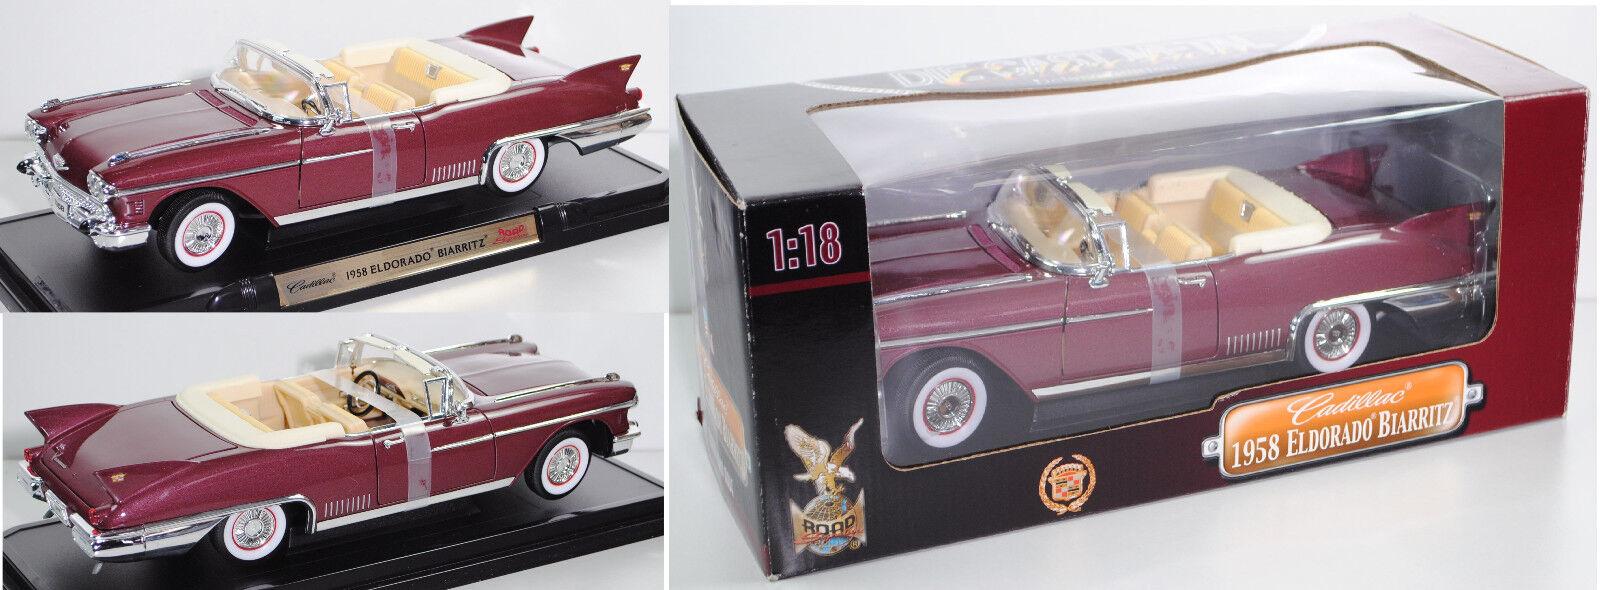 ROAD Signature   Yatming 5510863 Cadillac Eldorado Biarritz, weinrot, 1 18  | Großer Räumungsverkauf